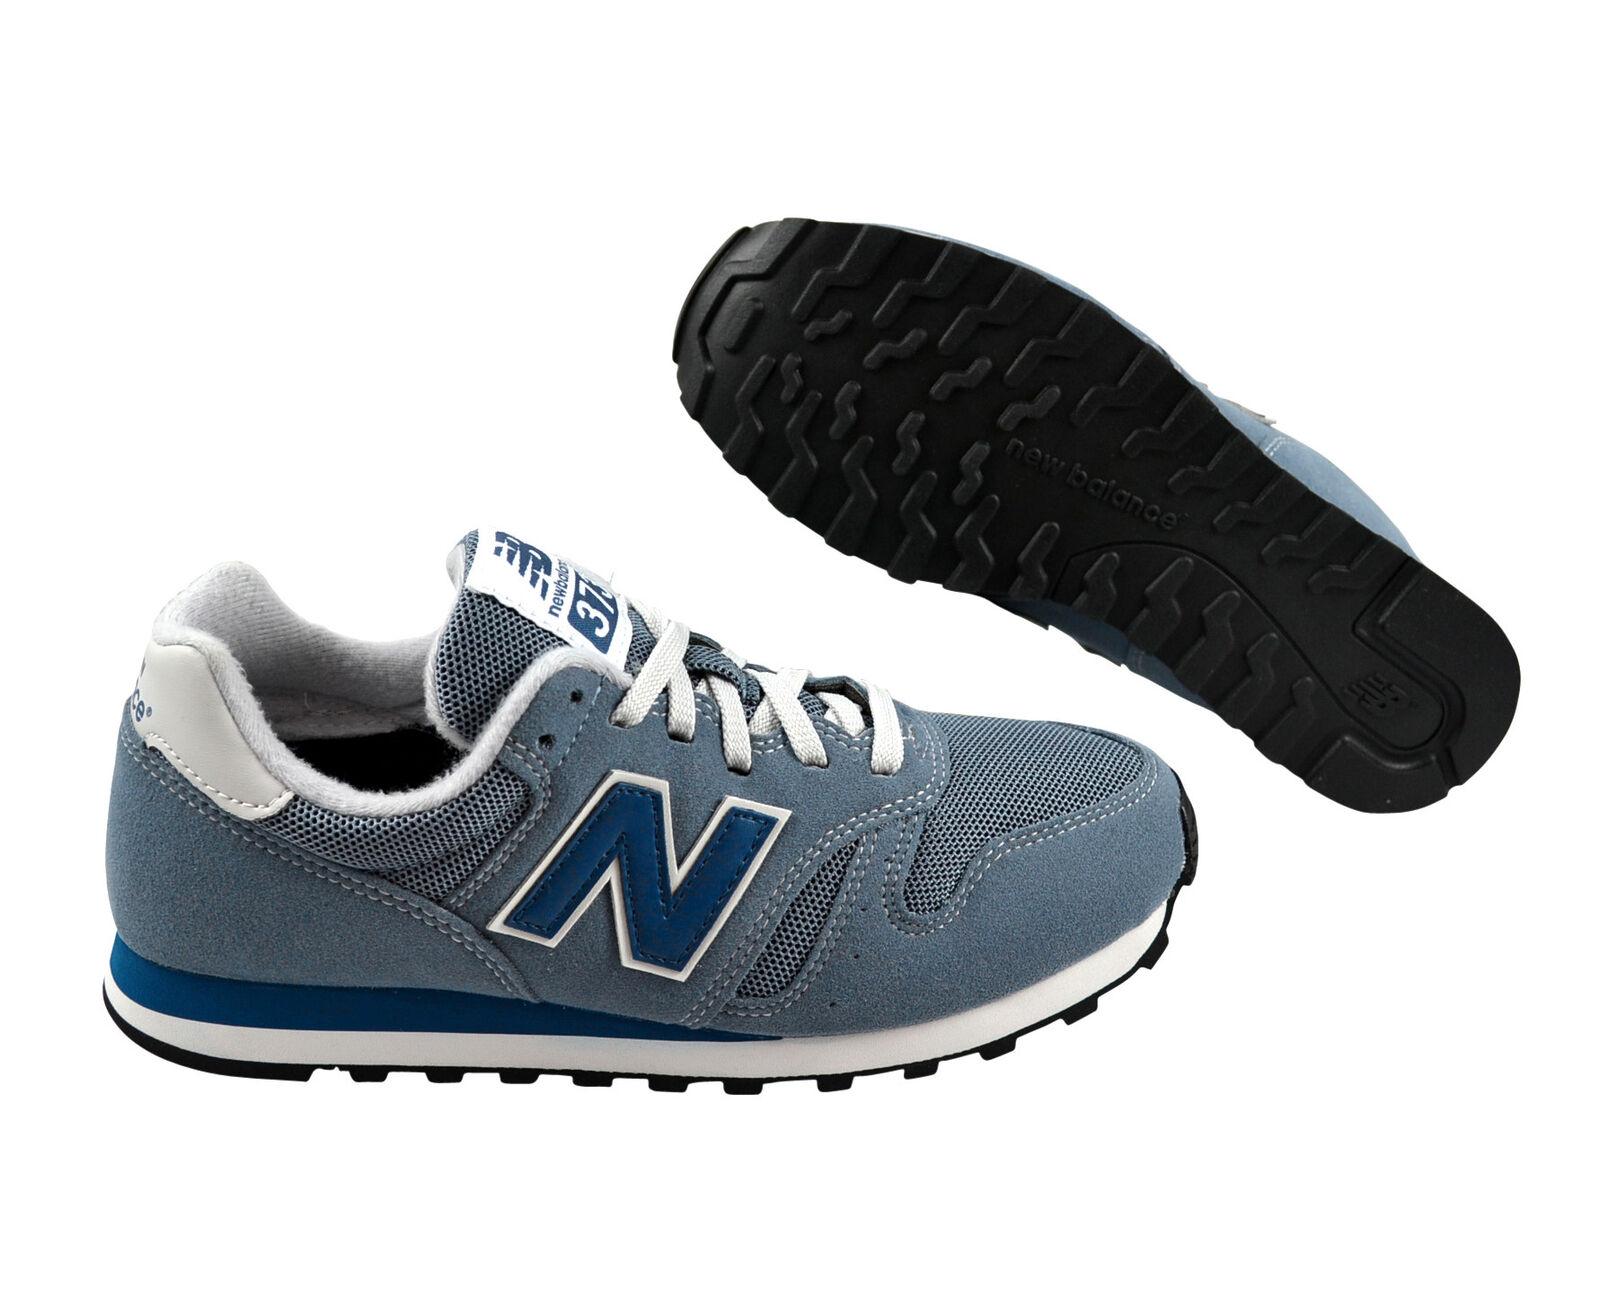 New Balance ML373 AB grau Schuhe Turnschuhe Turnschuhe Turnschuhe grau Größenauswahl d9de64